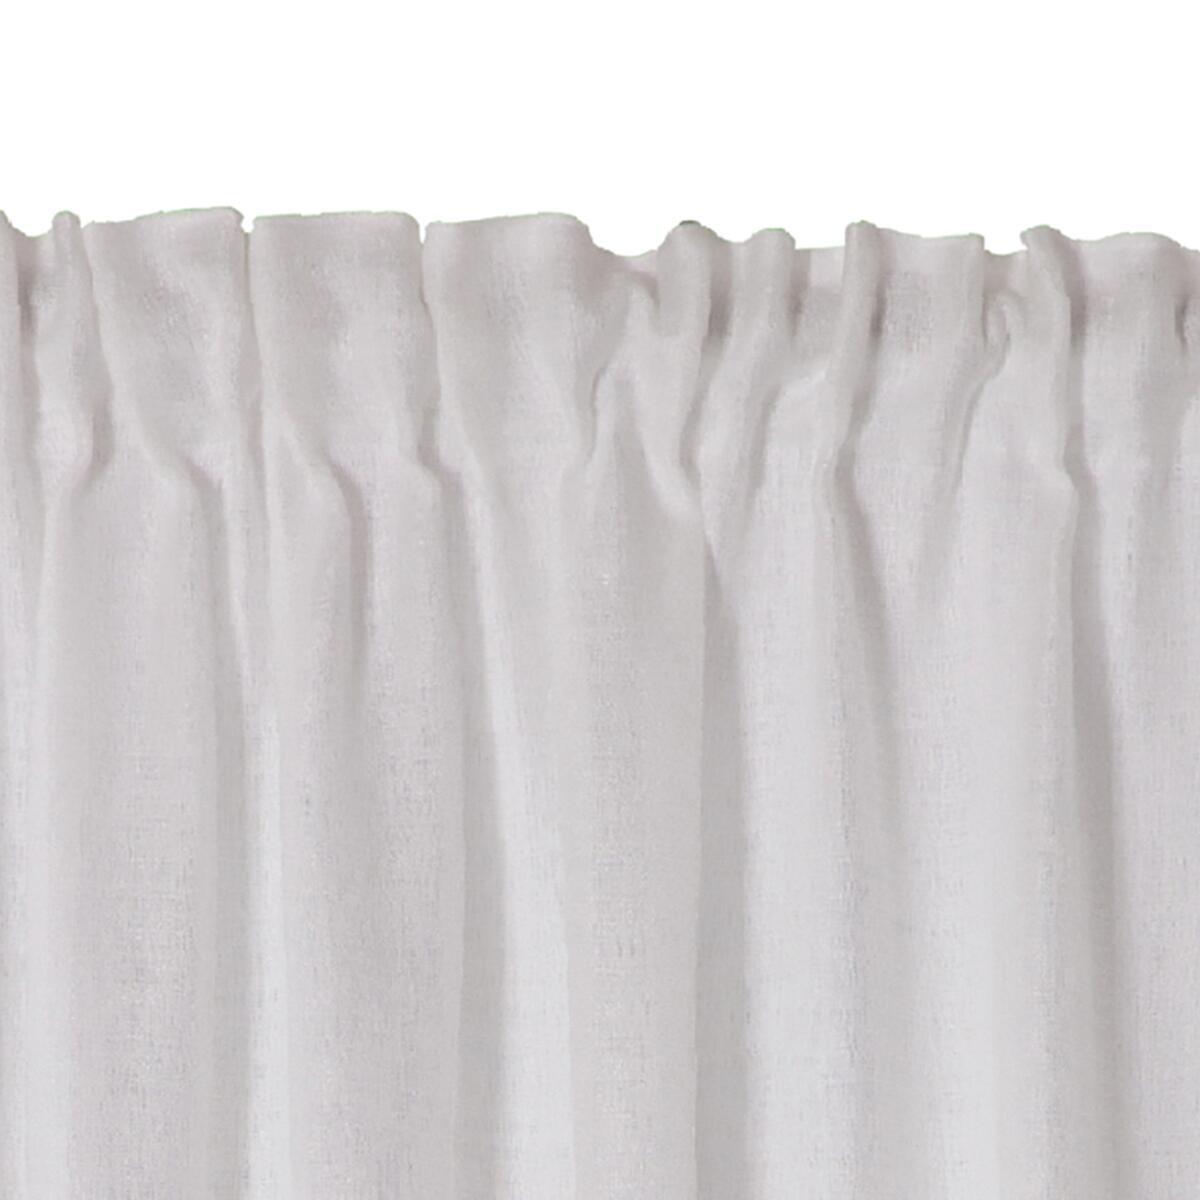 Tenda Oceania bianco fettuccia 140 x 300 cm - 5